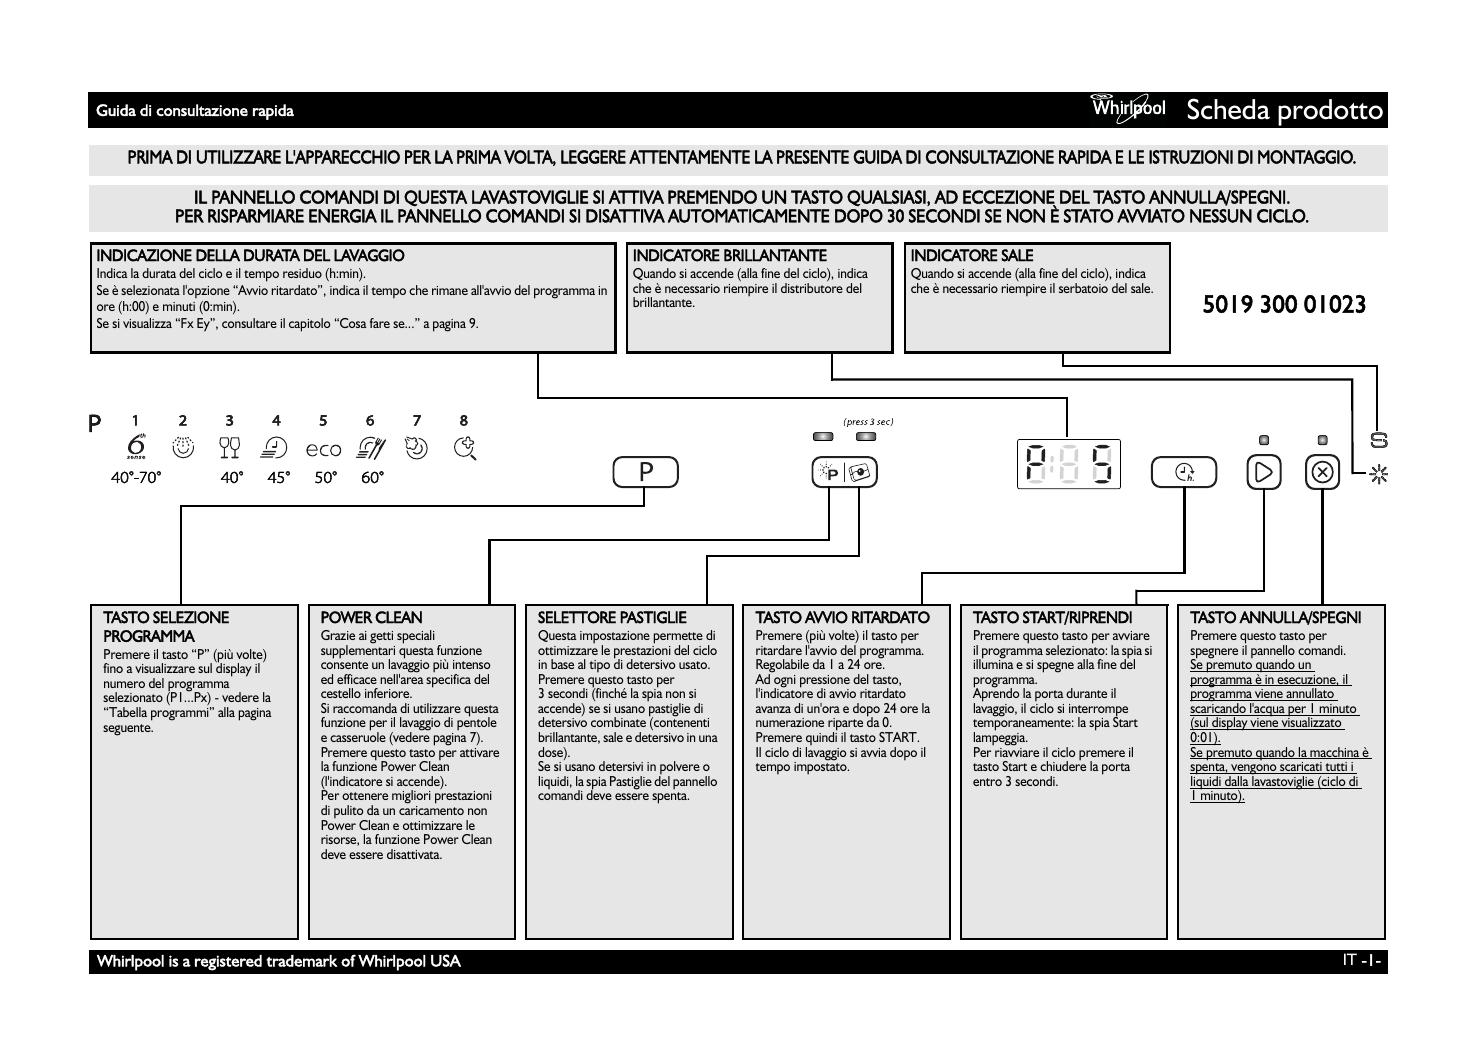 Lavastoviglie Bosch Spia Rubinetto Accesa.Whirlpool Adg 7653 1 A Instruction For Use Manualzz Com